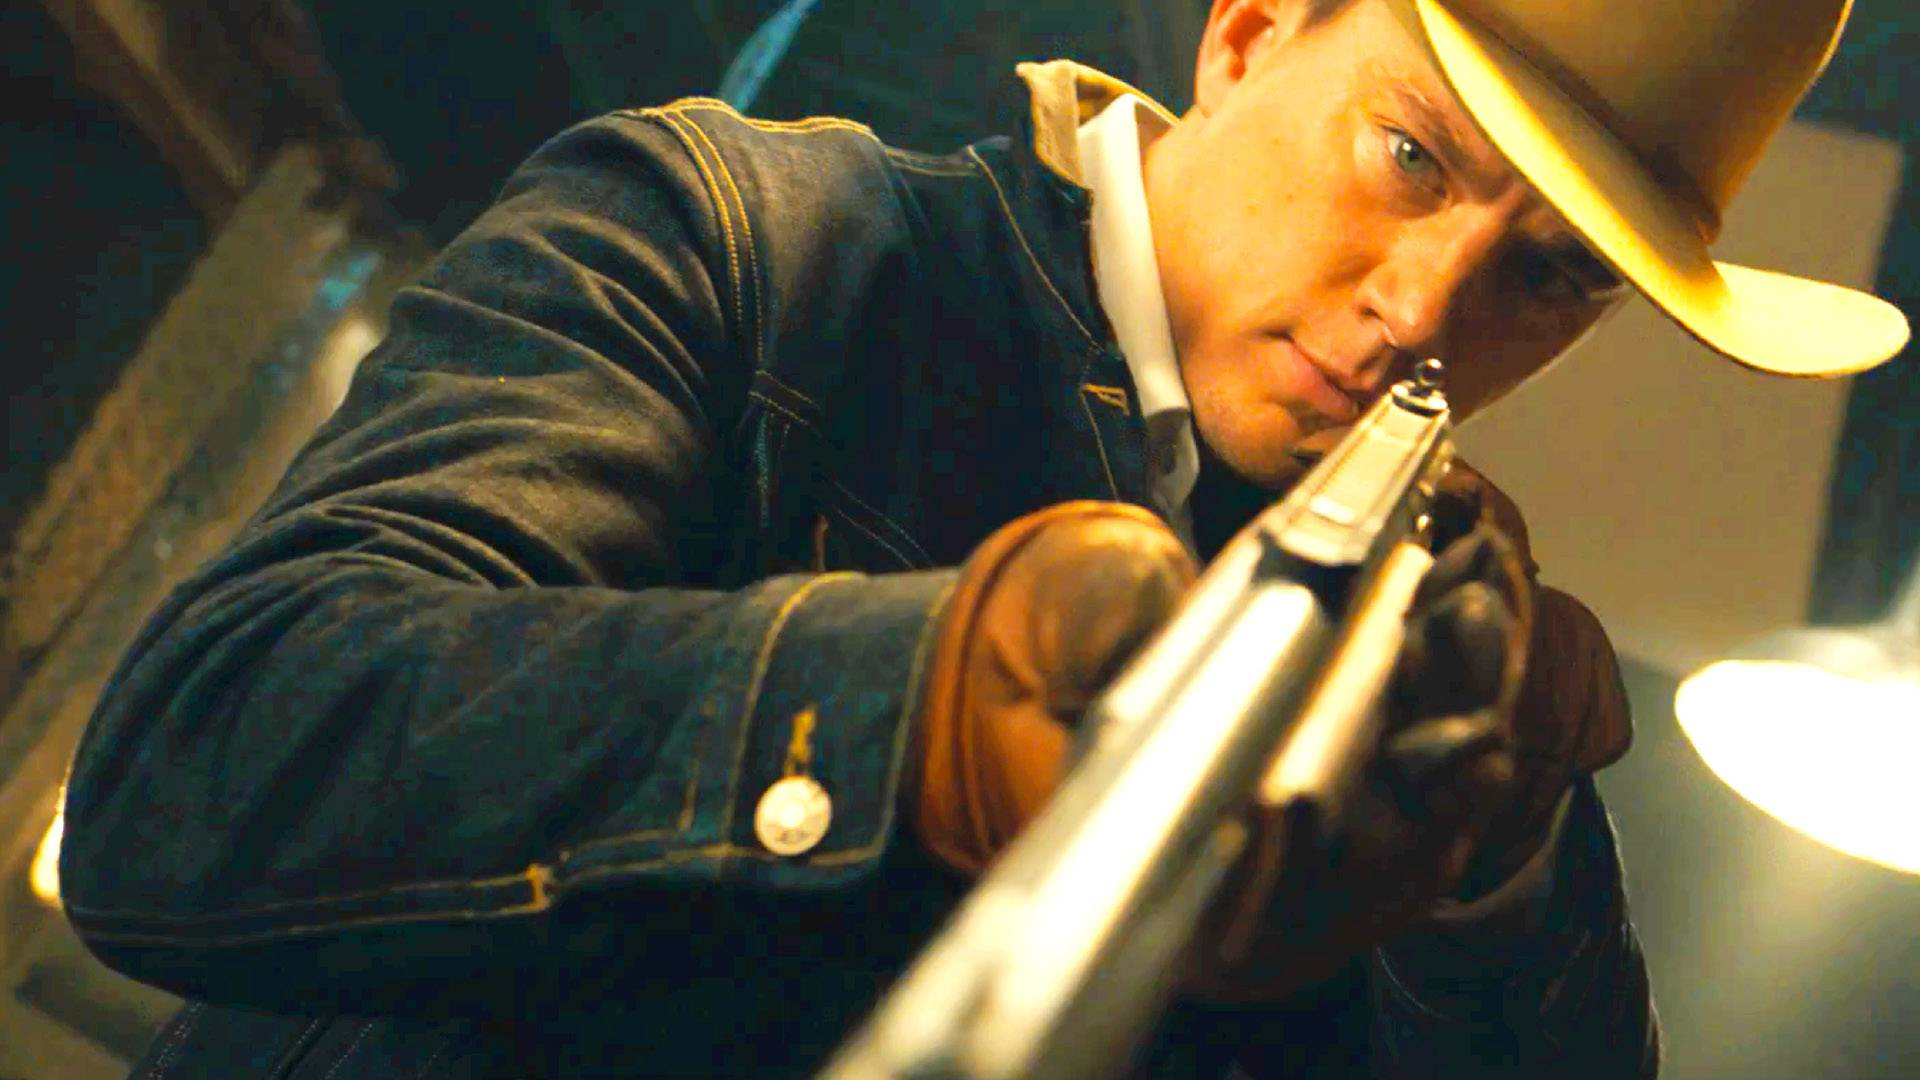 Kingsman: Золотое кольцо — от шпионов-джентльменов к шпионам-ковбоям